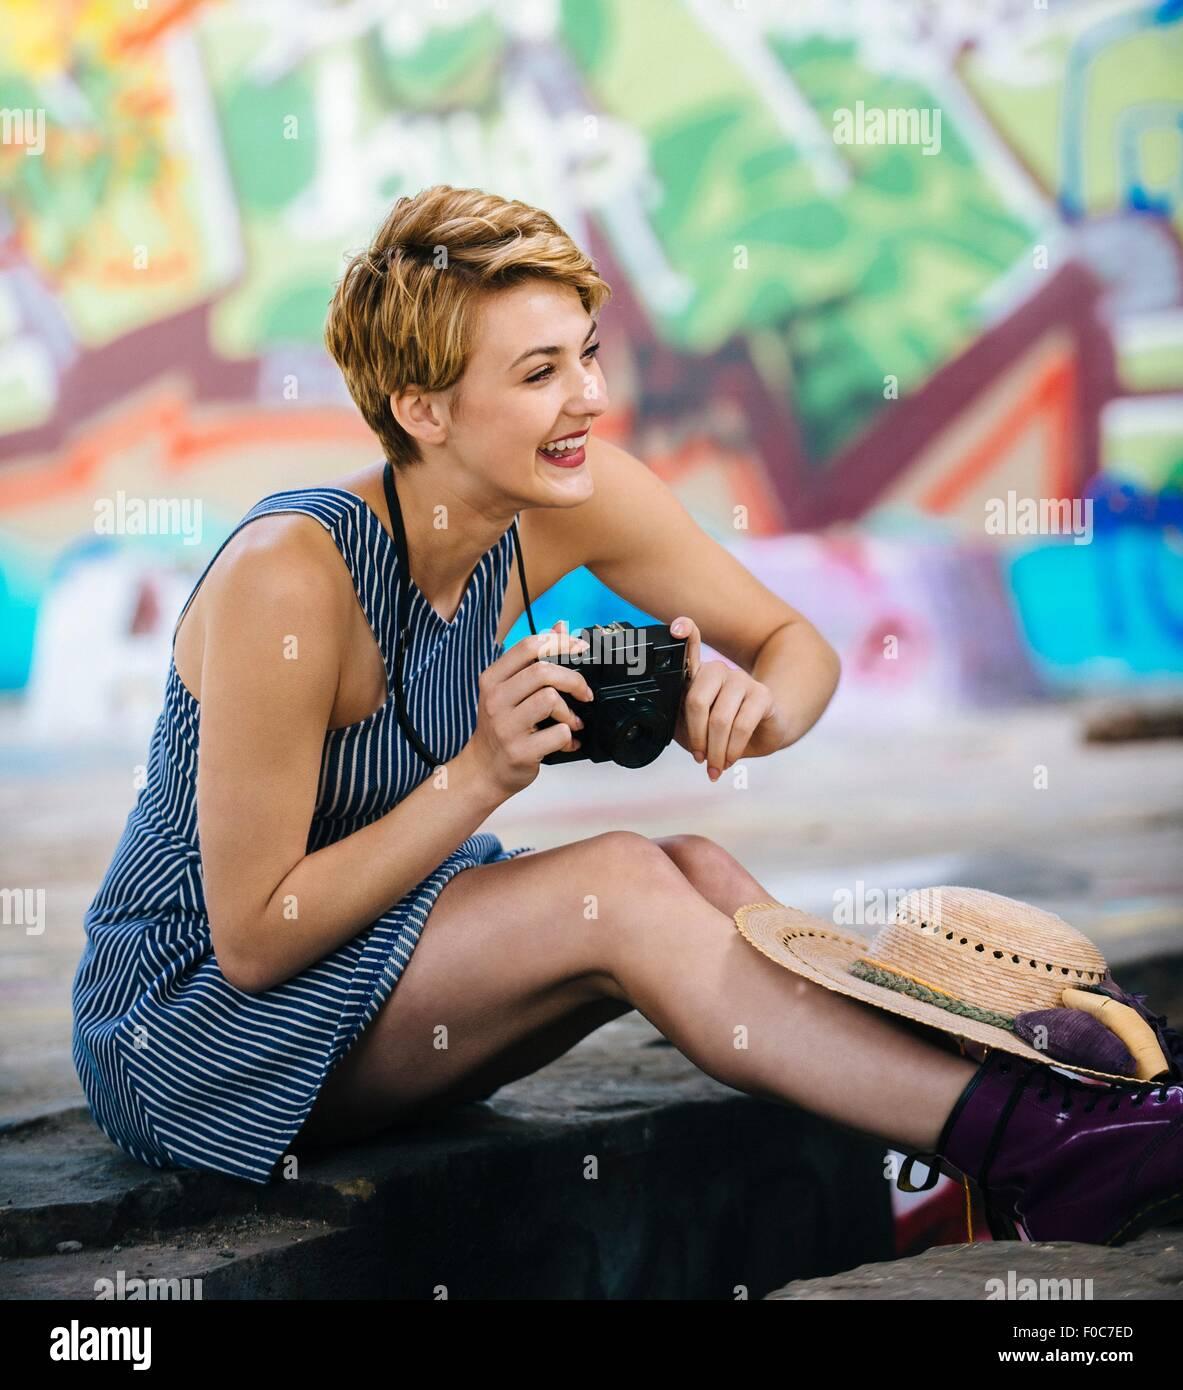 Stylish teenage girl sitting on sidewalk with camera in front of graffiti wall - Stock Image